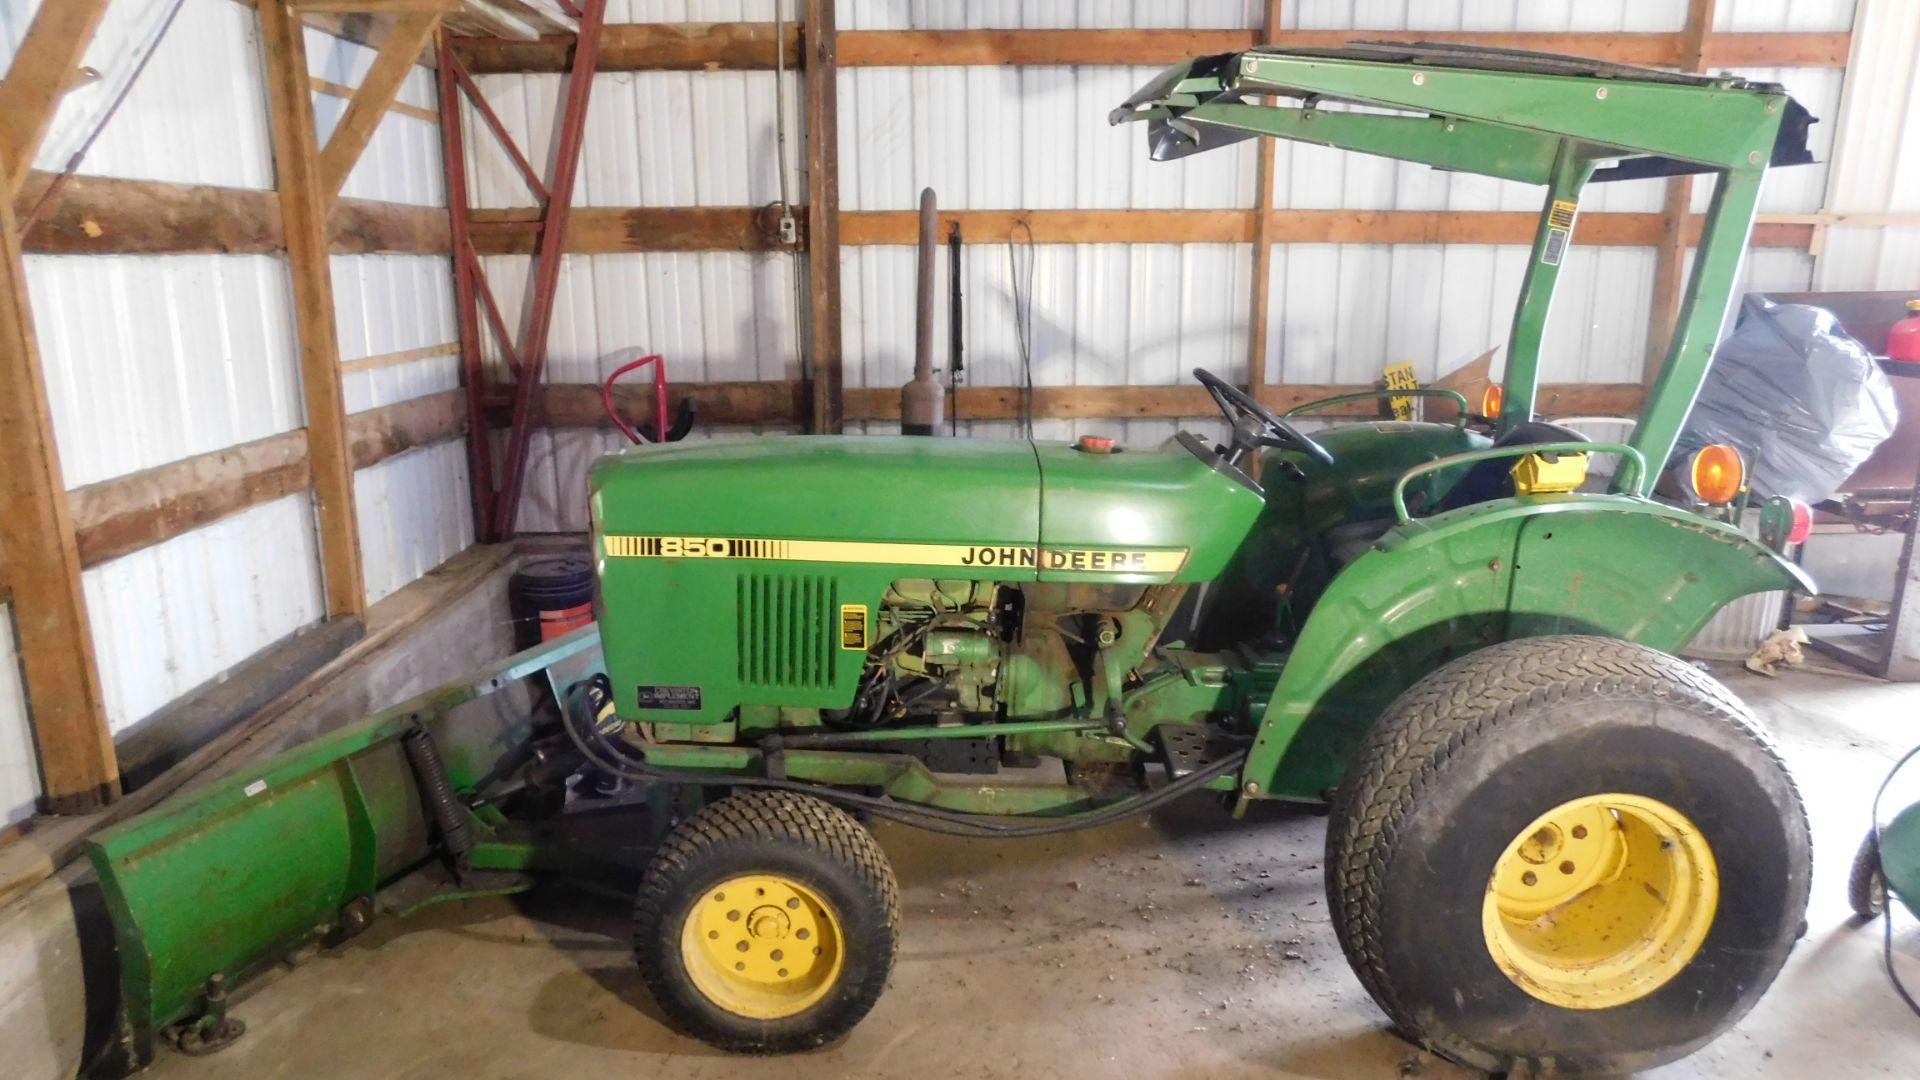 Lot 45 - John Deere Model 850 Tractor, with Snow Blade, s/n 10691GL